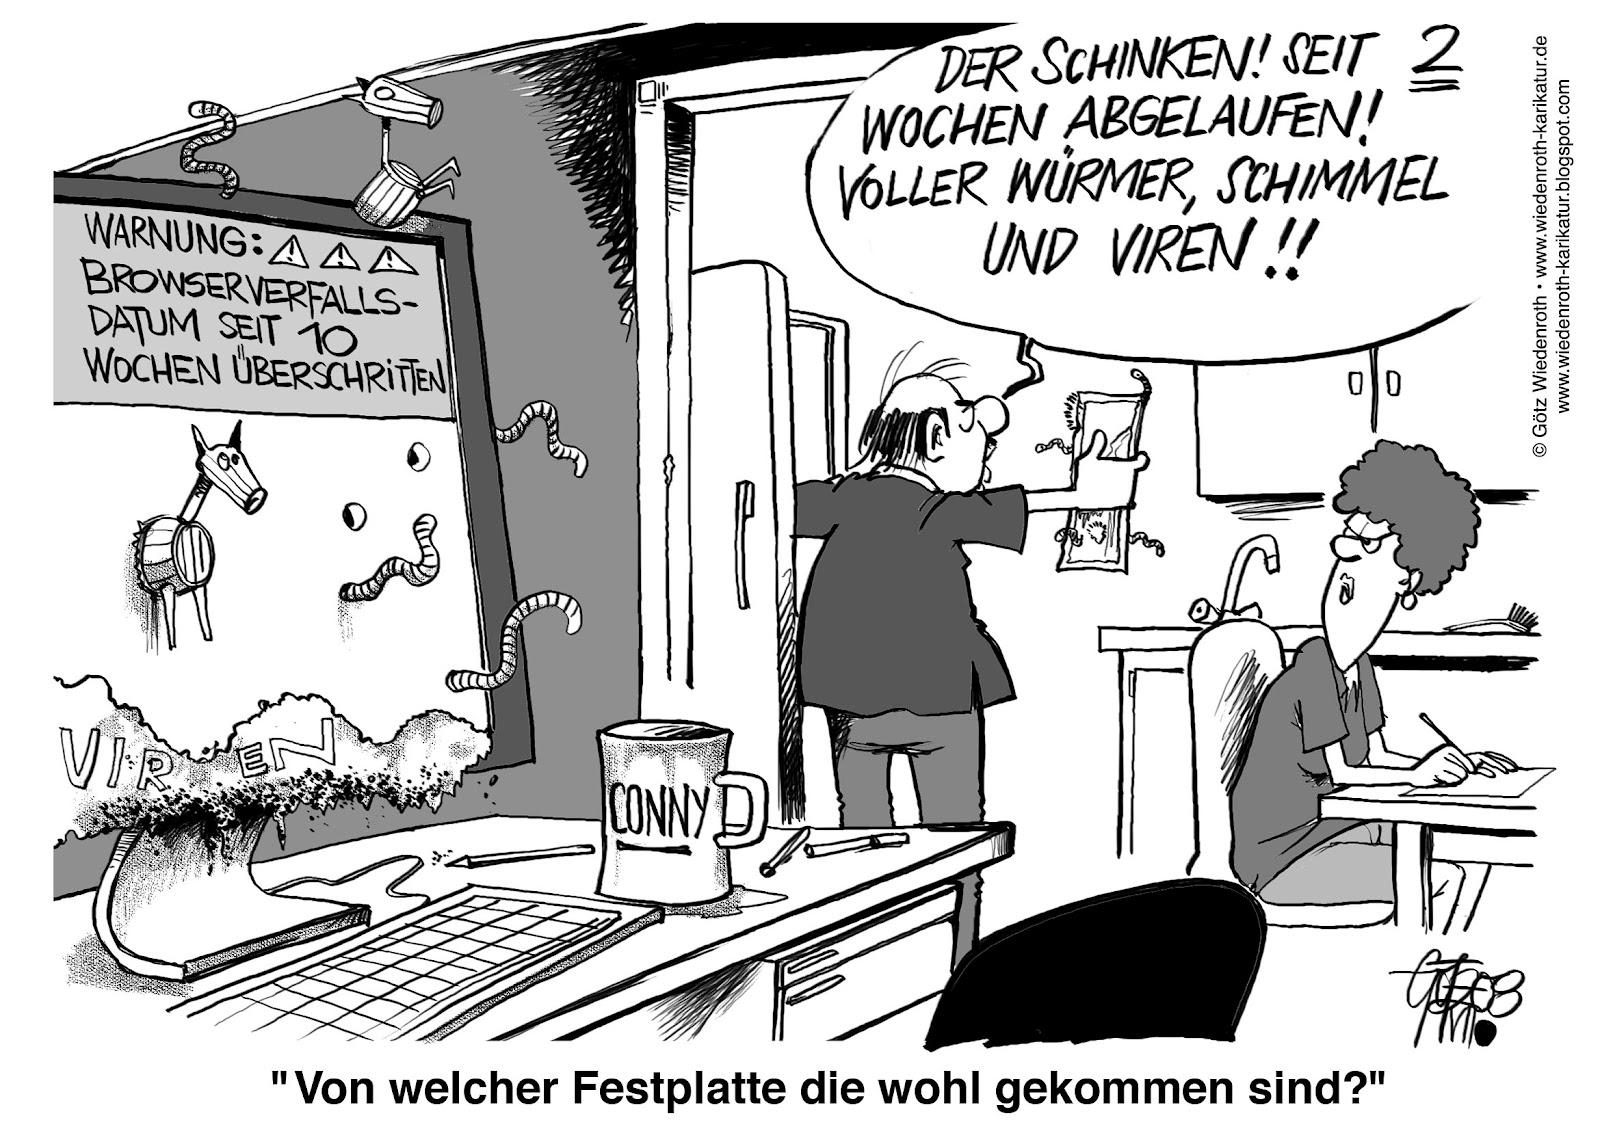 computer: festplatten-hygiene. | karikamur-karikatur! - wiedenroth - Würmer Küche